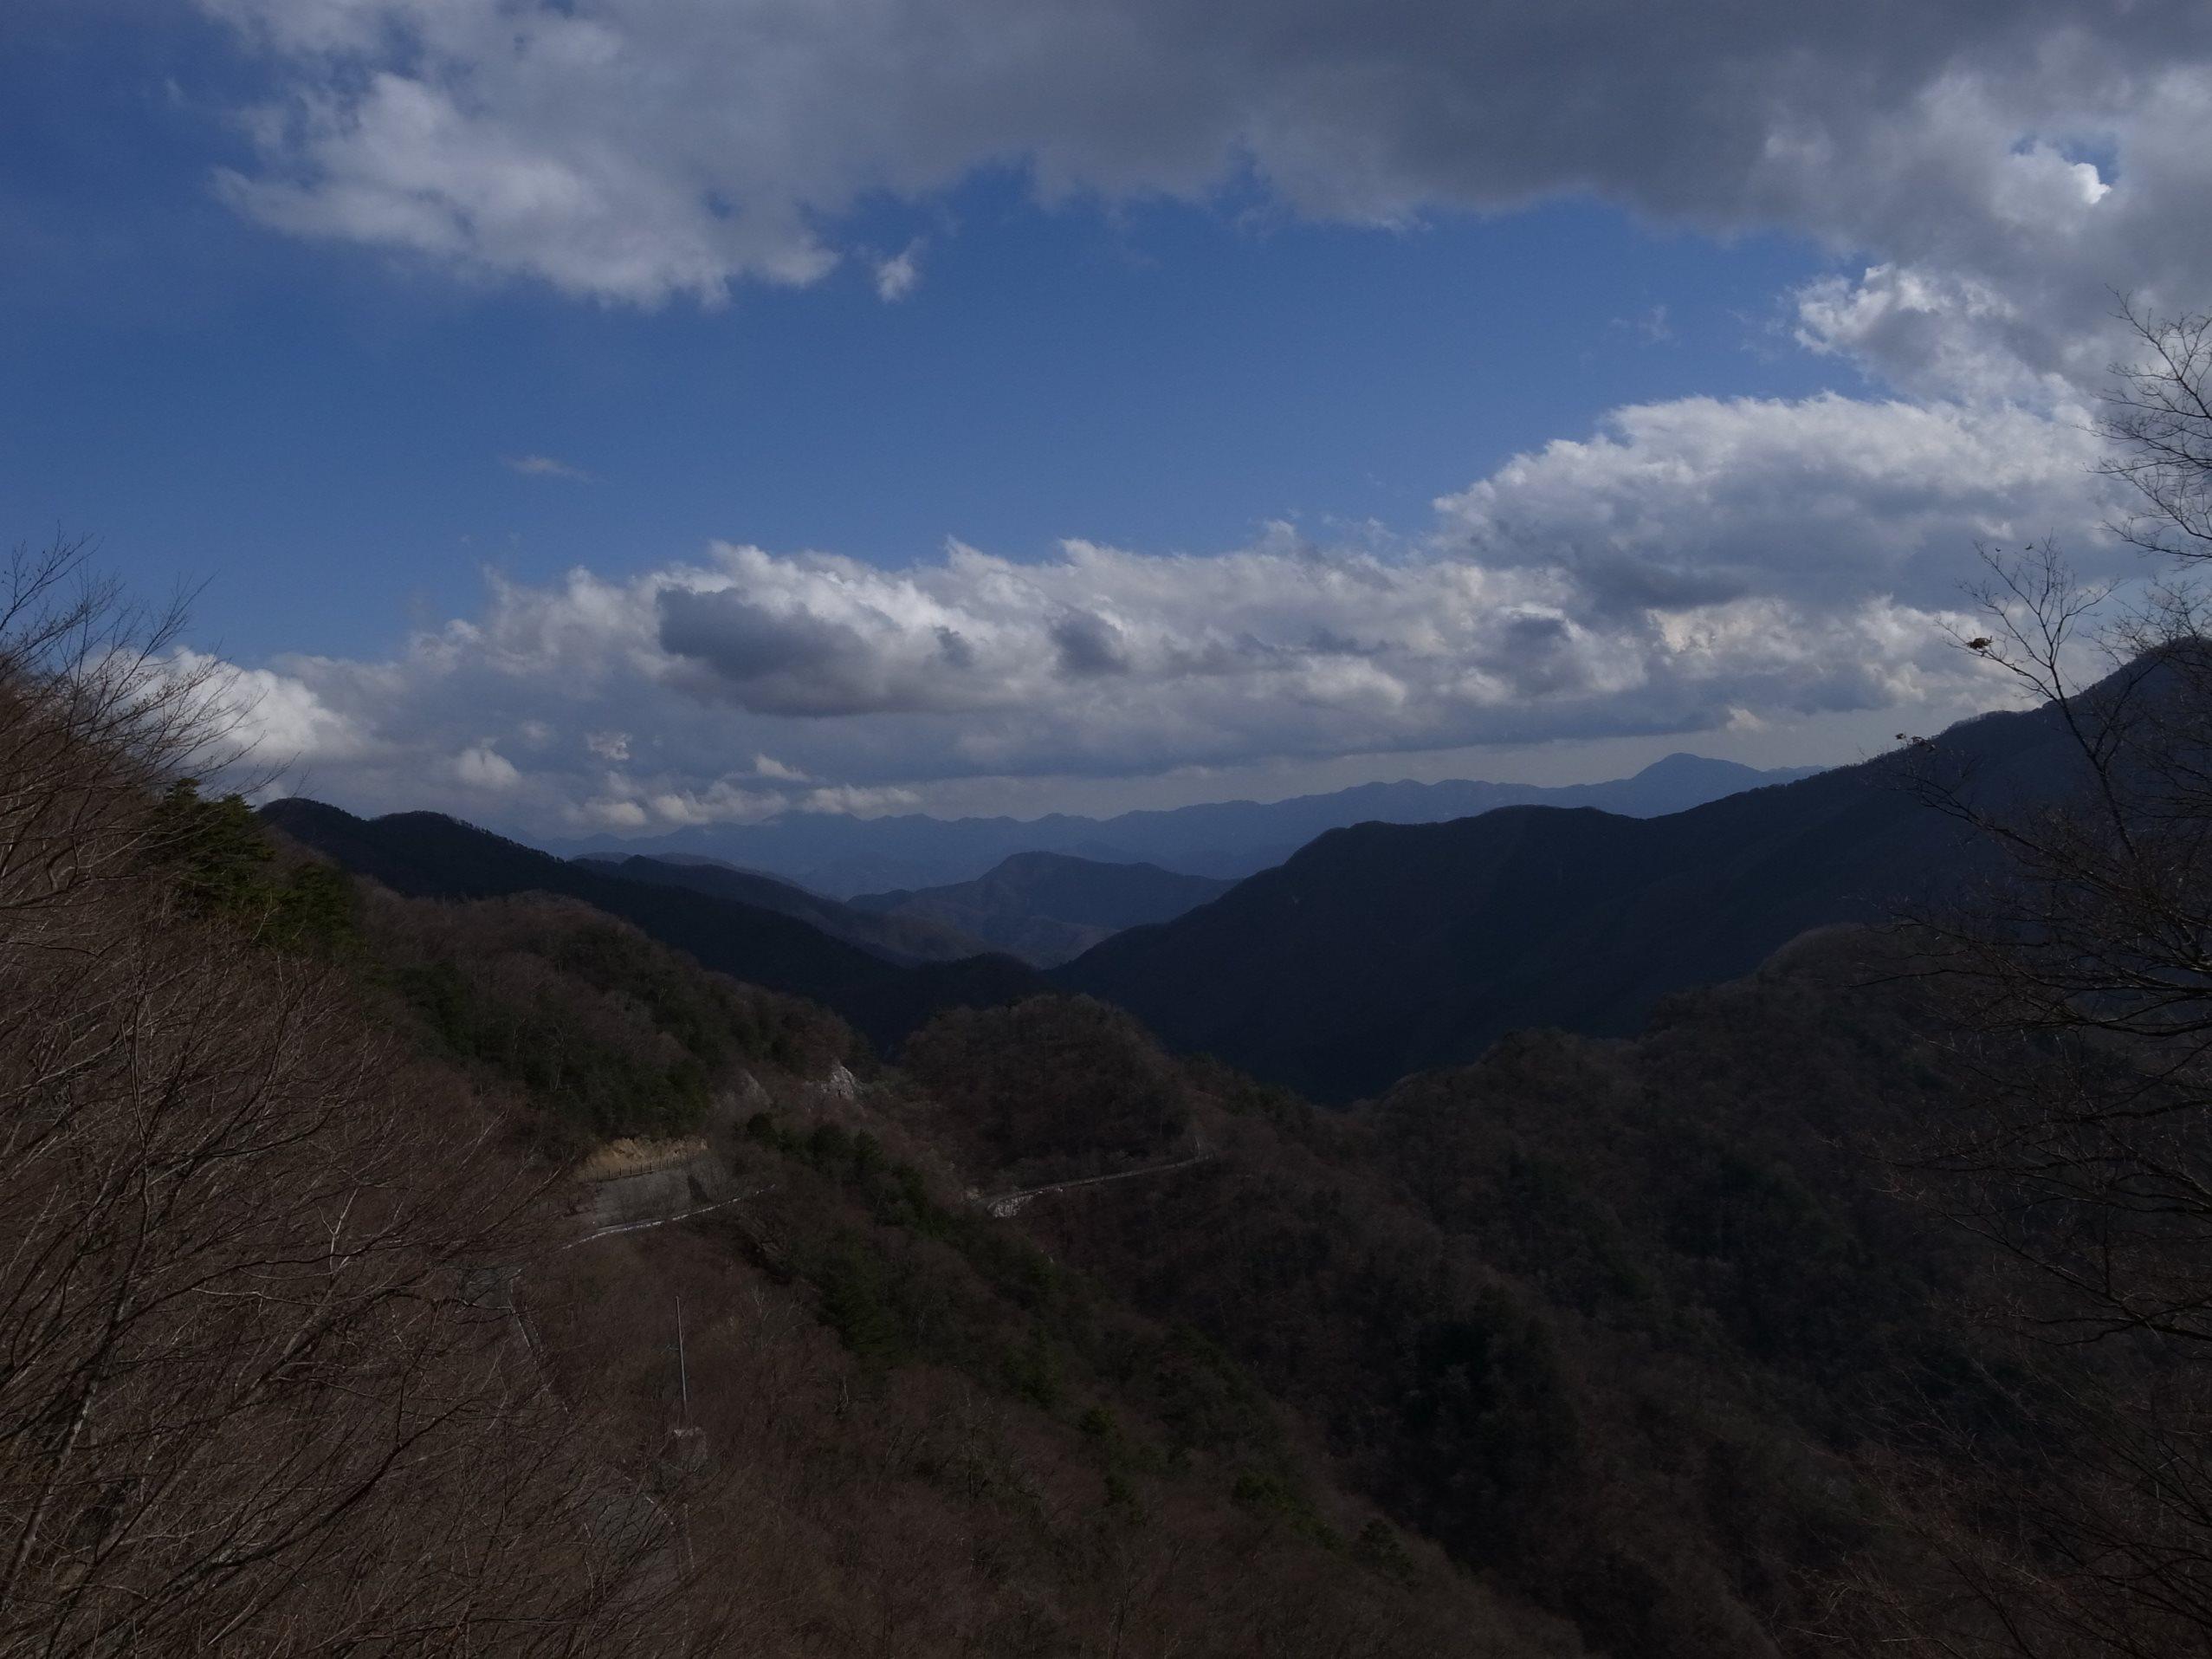 BD-1サイクリング 猿橋→松姫峠→小菅の湯→奥多摩